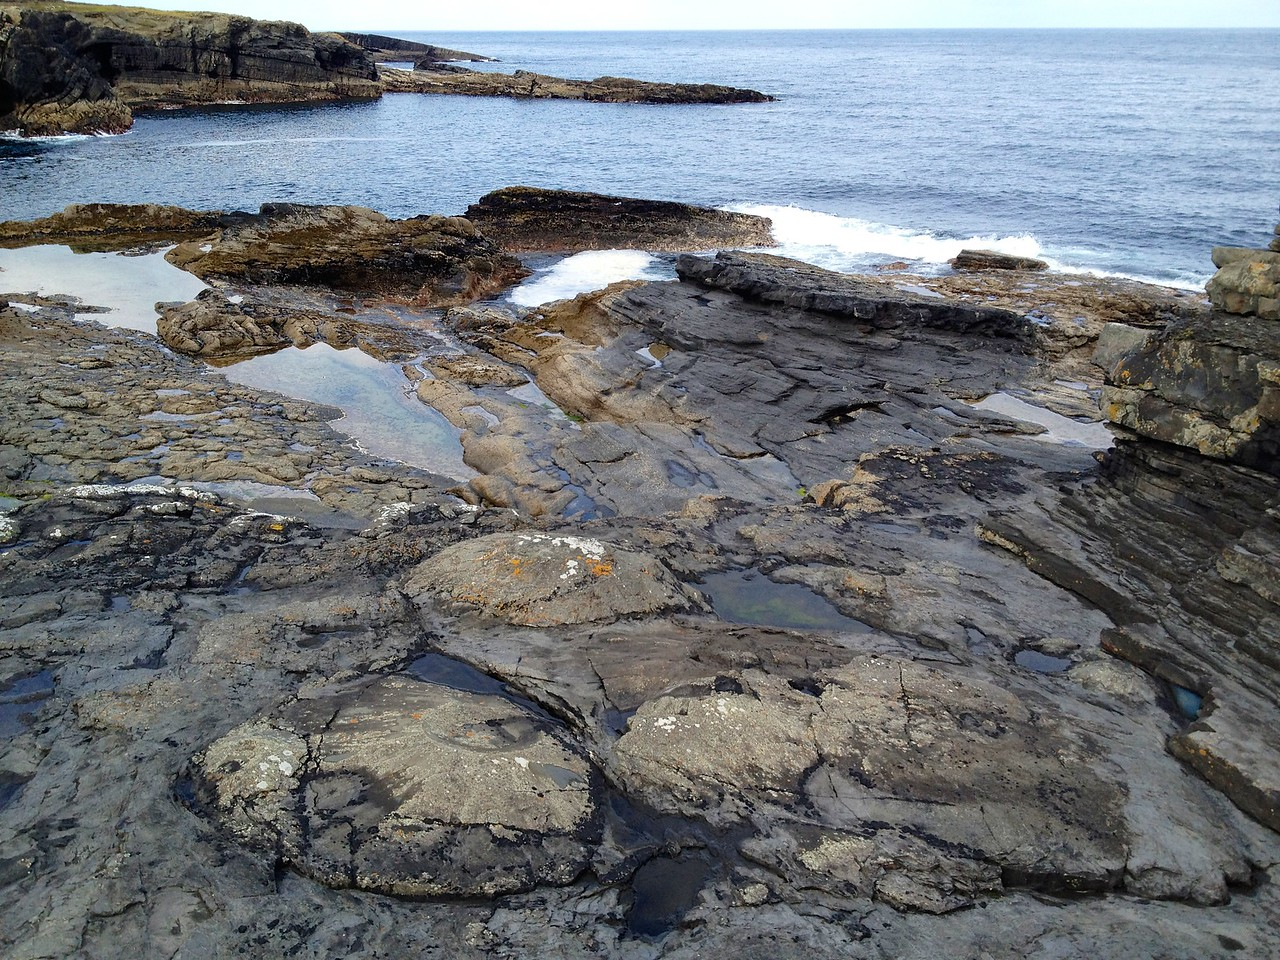 Sand volcanoes in the Ross Formation, near Bridges of Ross